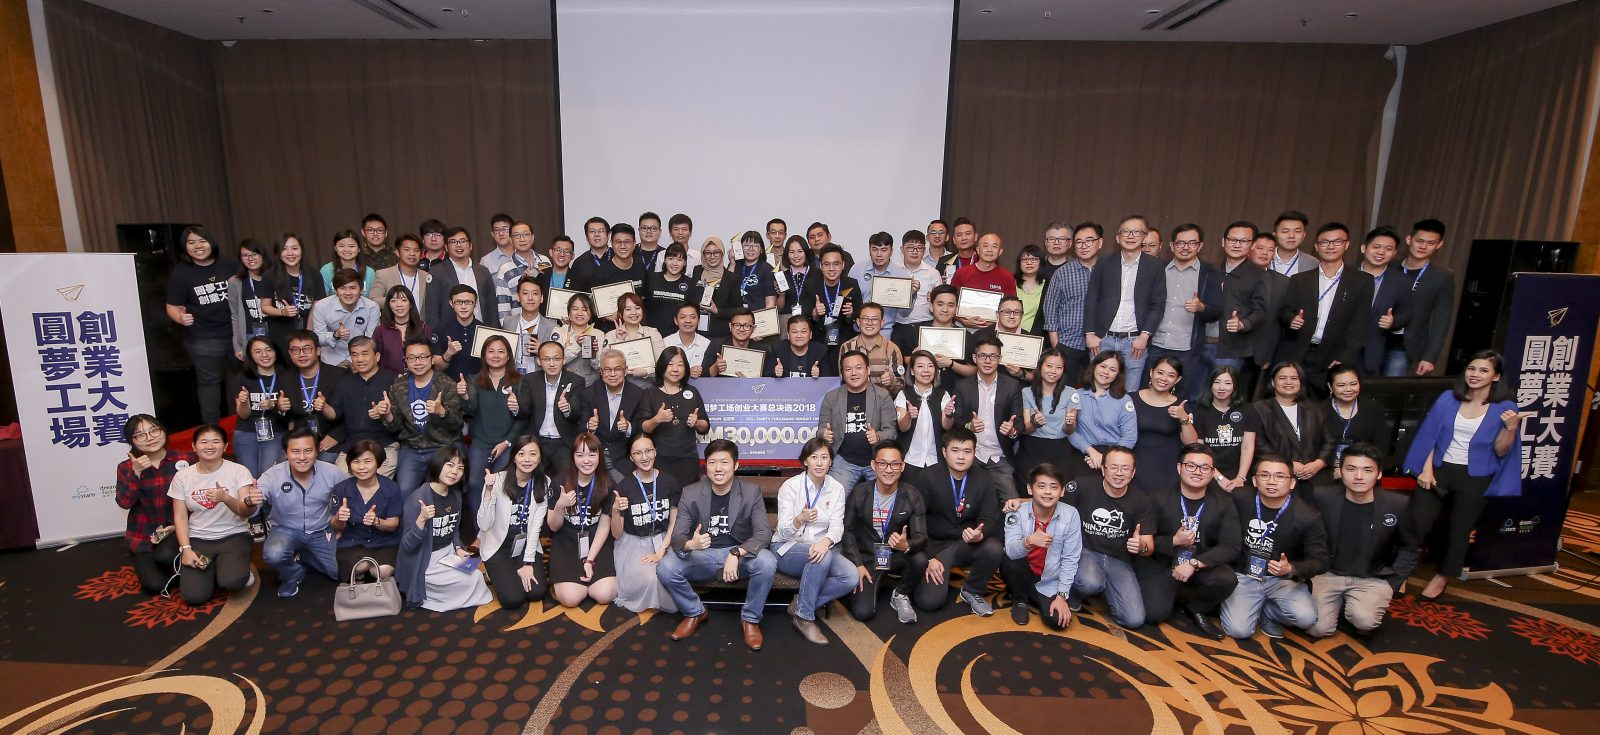 dream factory startup contest